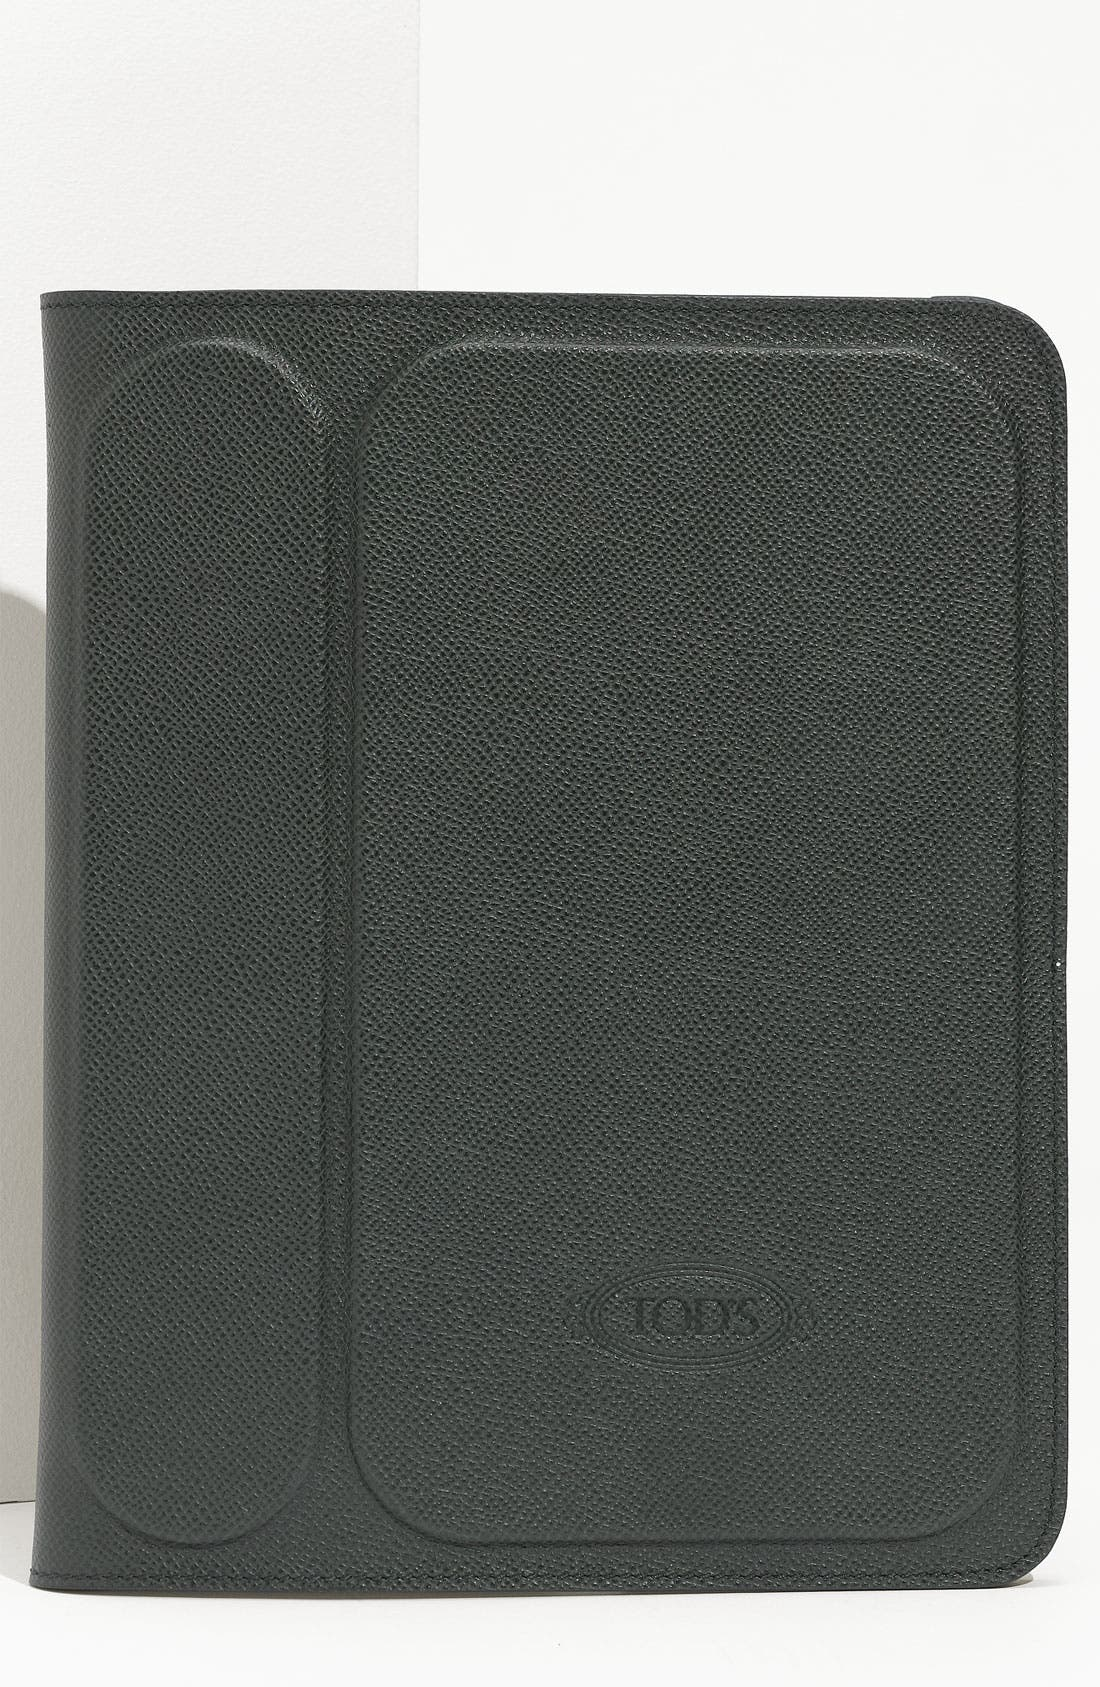 Main Image - Tod's Leather iPad Case